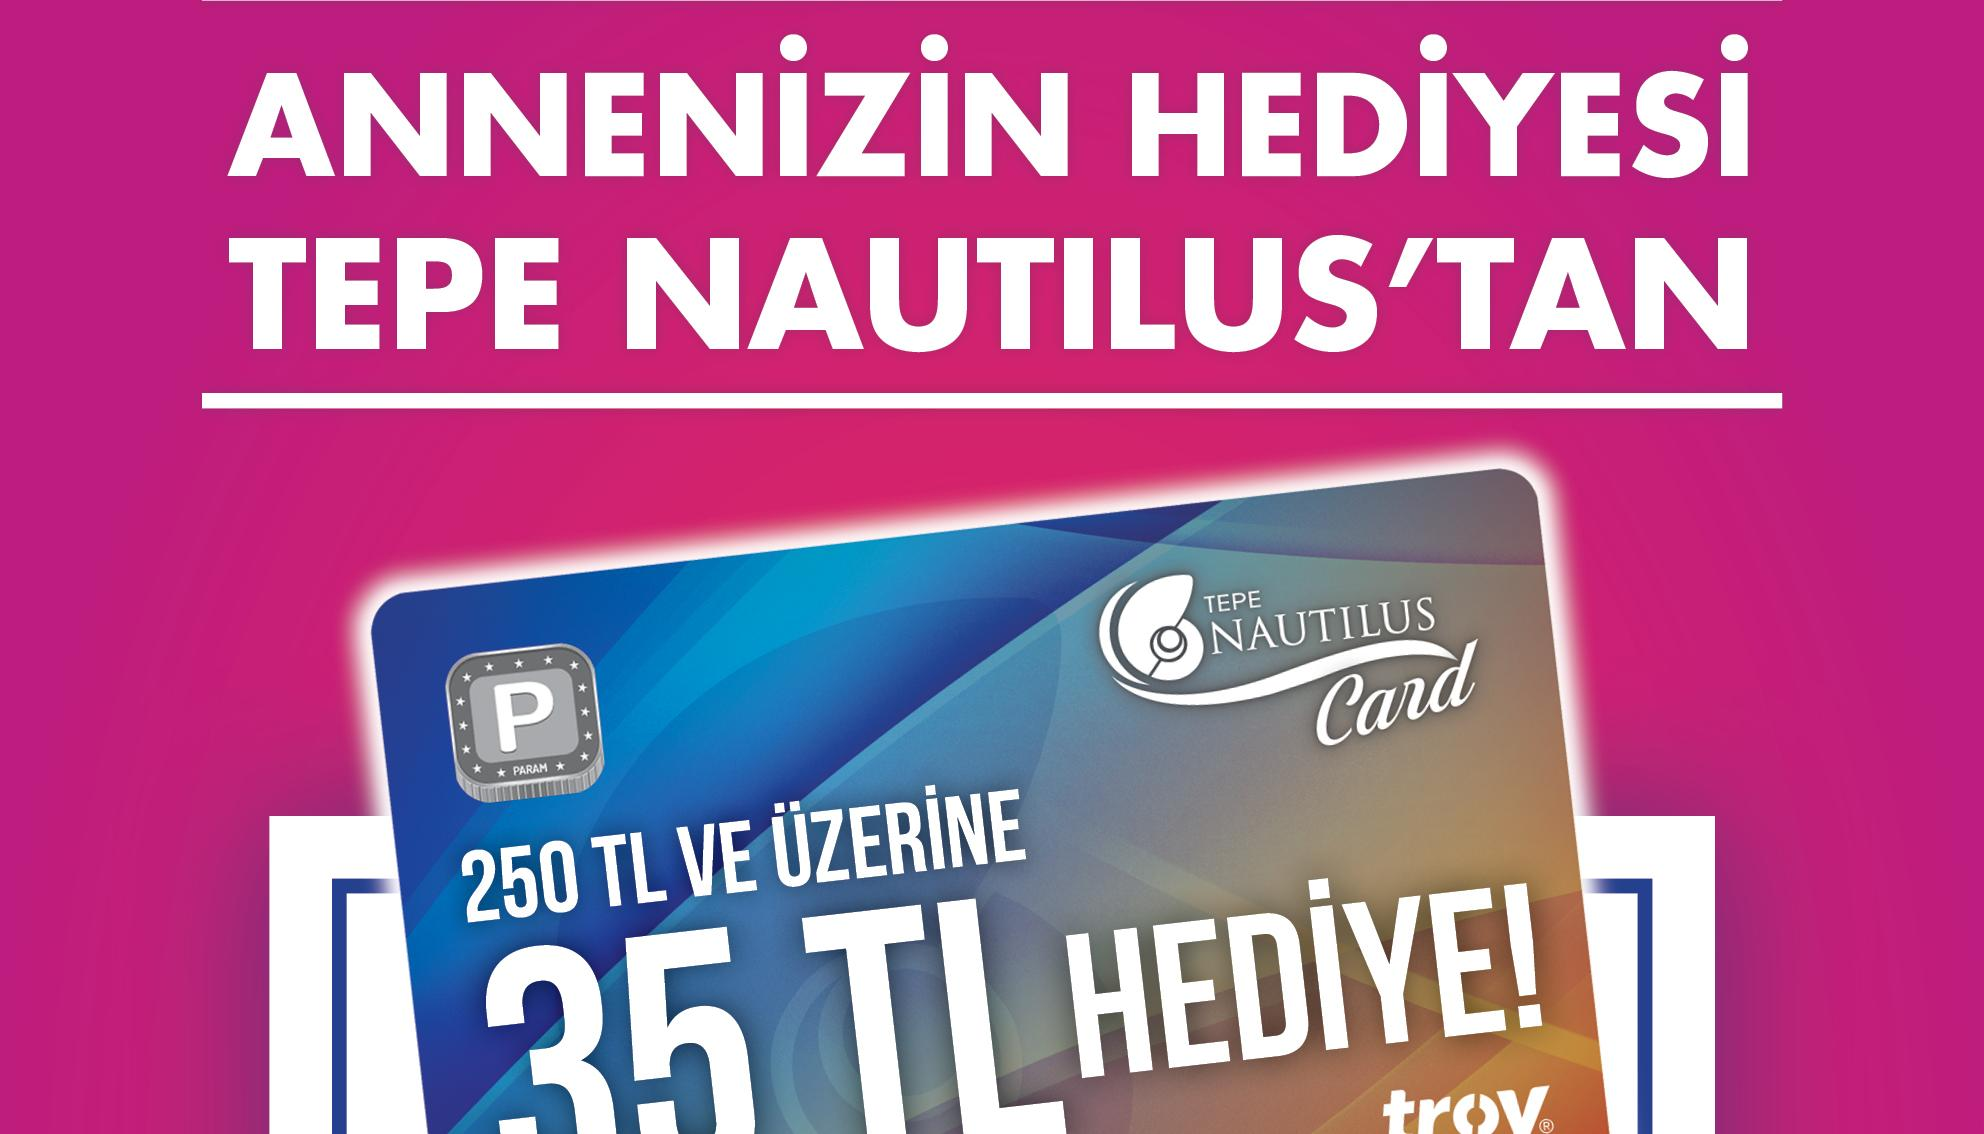 ANNENİZİN HEDİYESİ TEPE NAUTILUS'TAN